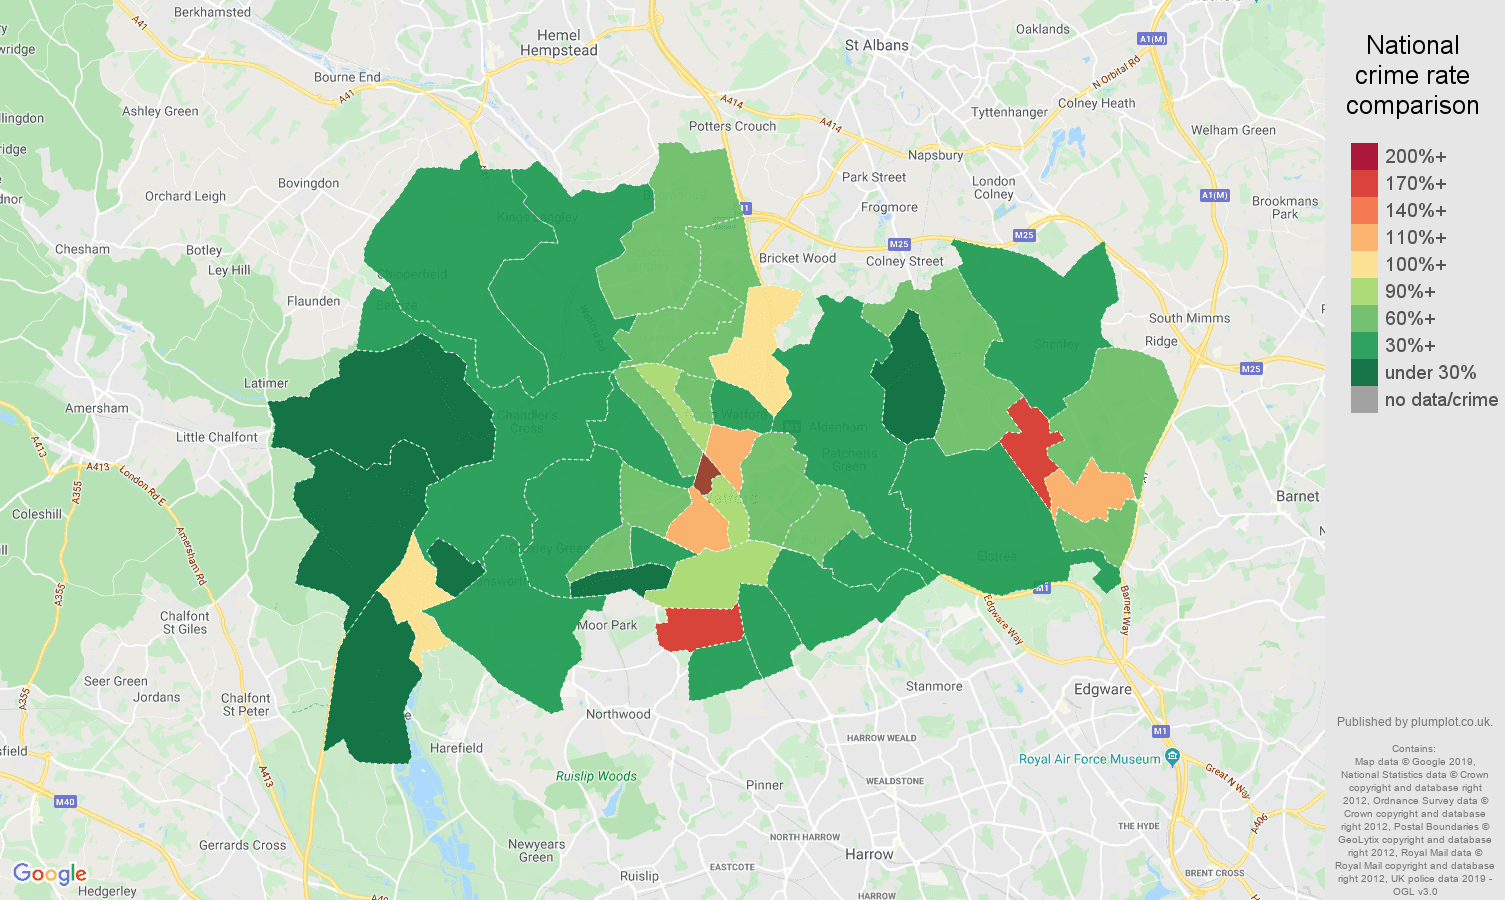 Watford public order crime rate comparison map